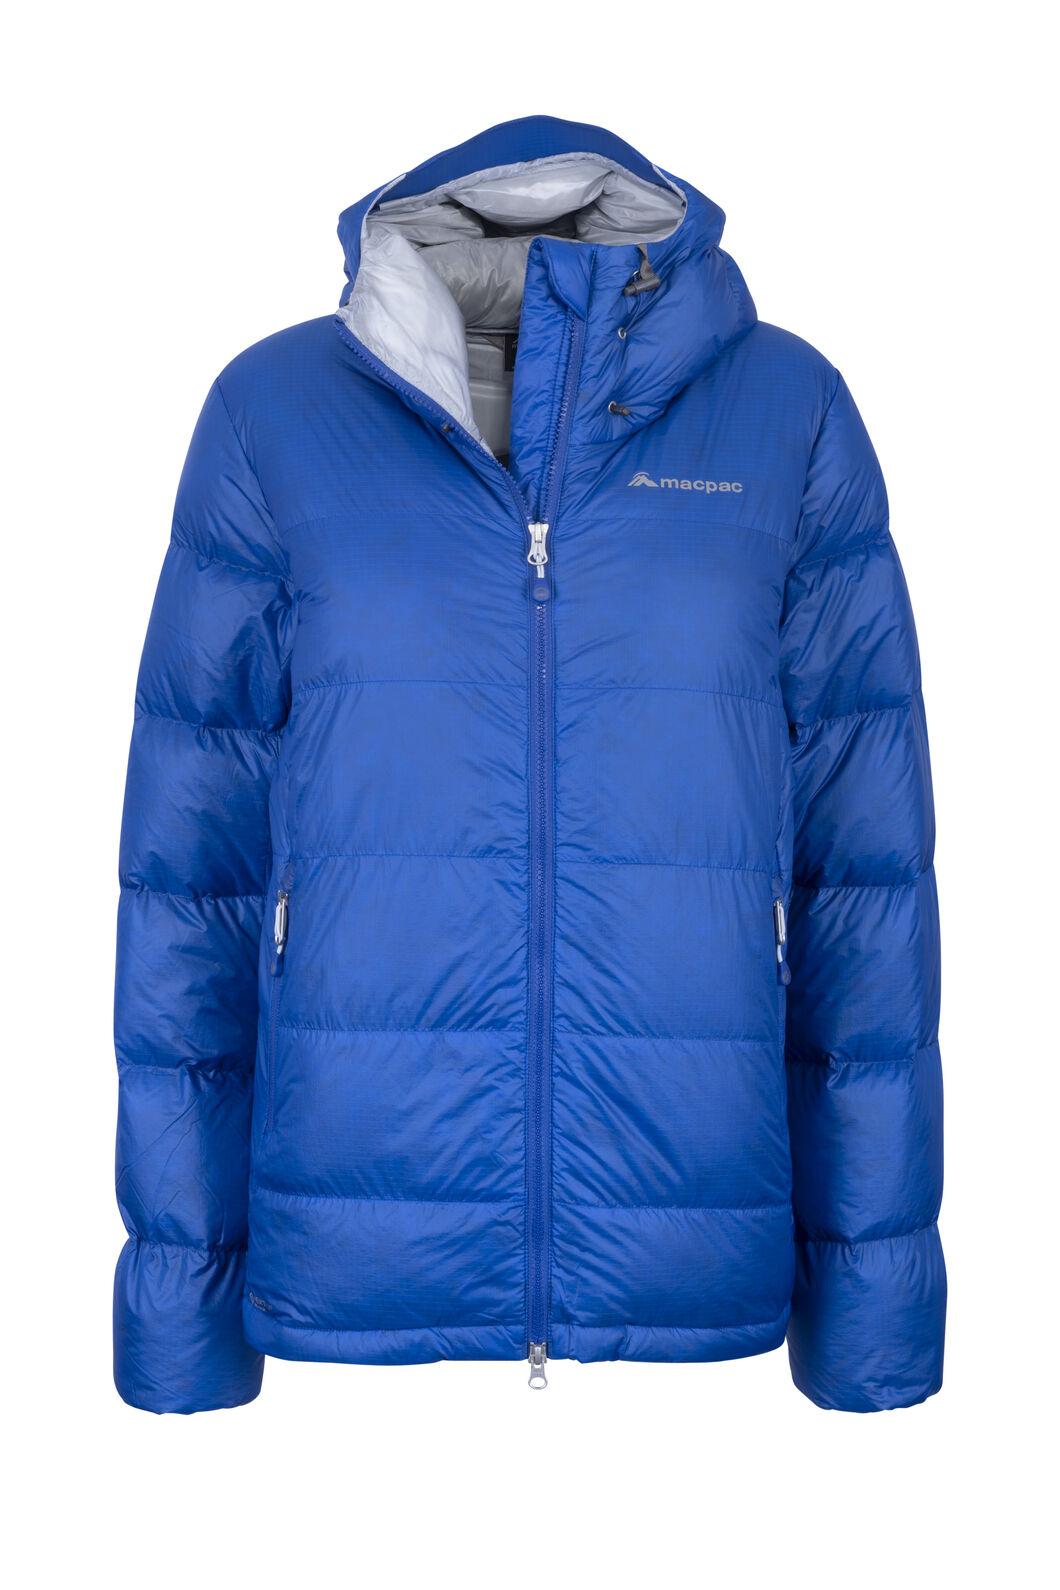 Macpac Women's NZAT Arrowsmith HyperDRY™ Hooded Down Jacket, Nautical Blue, hi-res